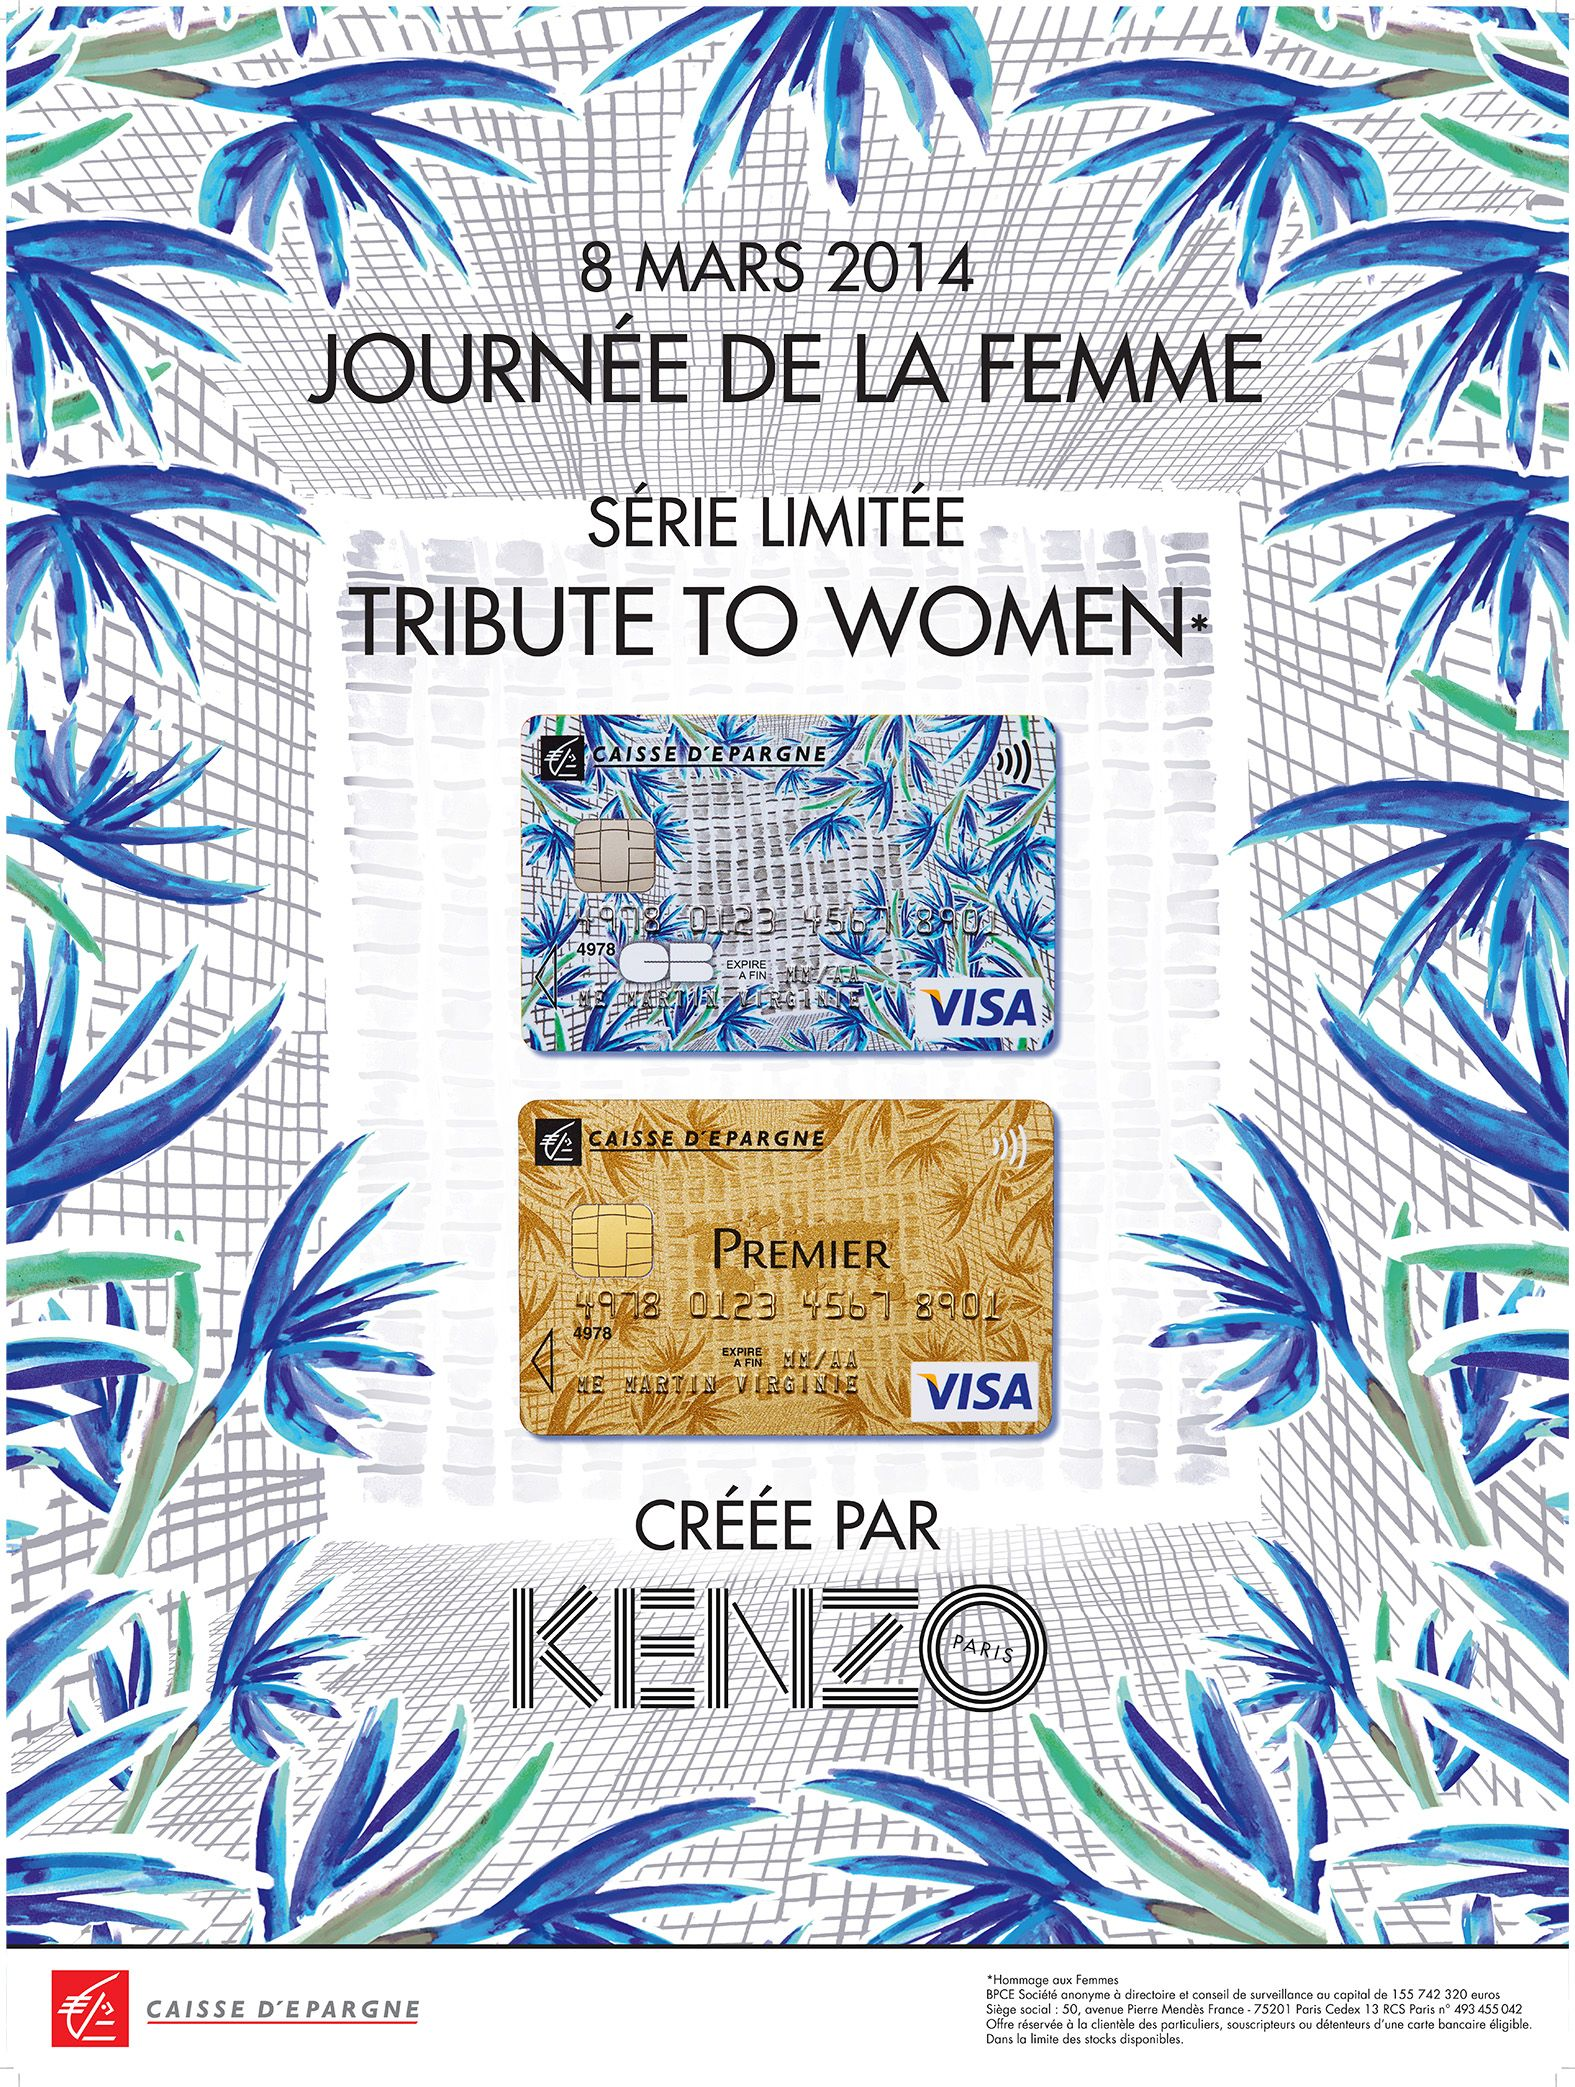 Kenzo X La Caisse D Epargne A Partnership Signed Thanks To